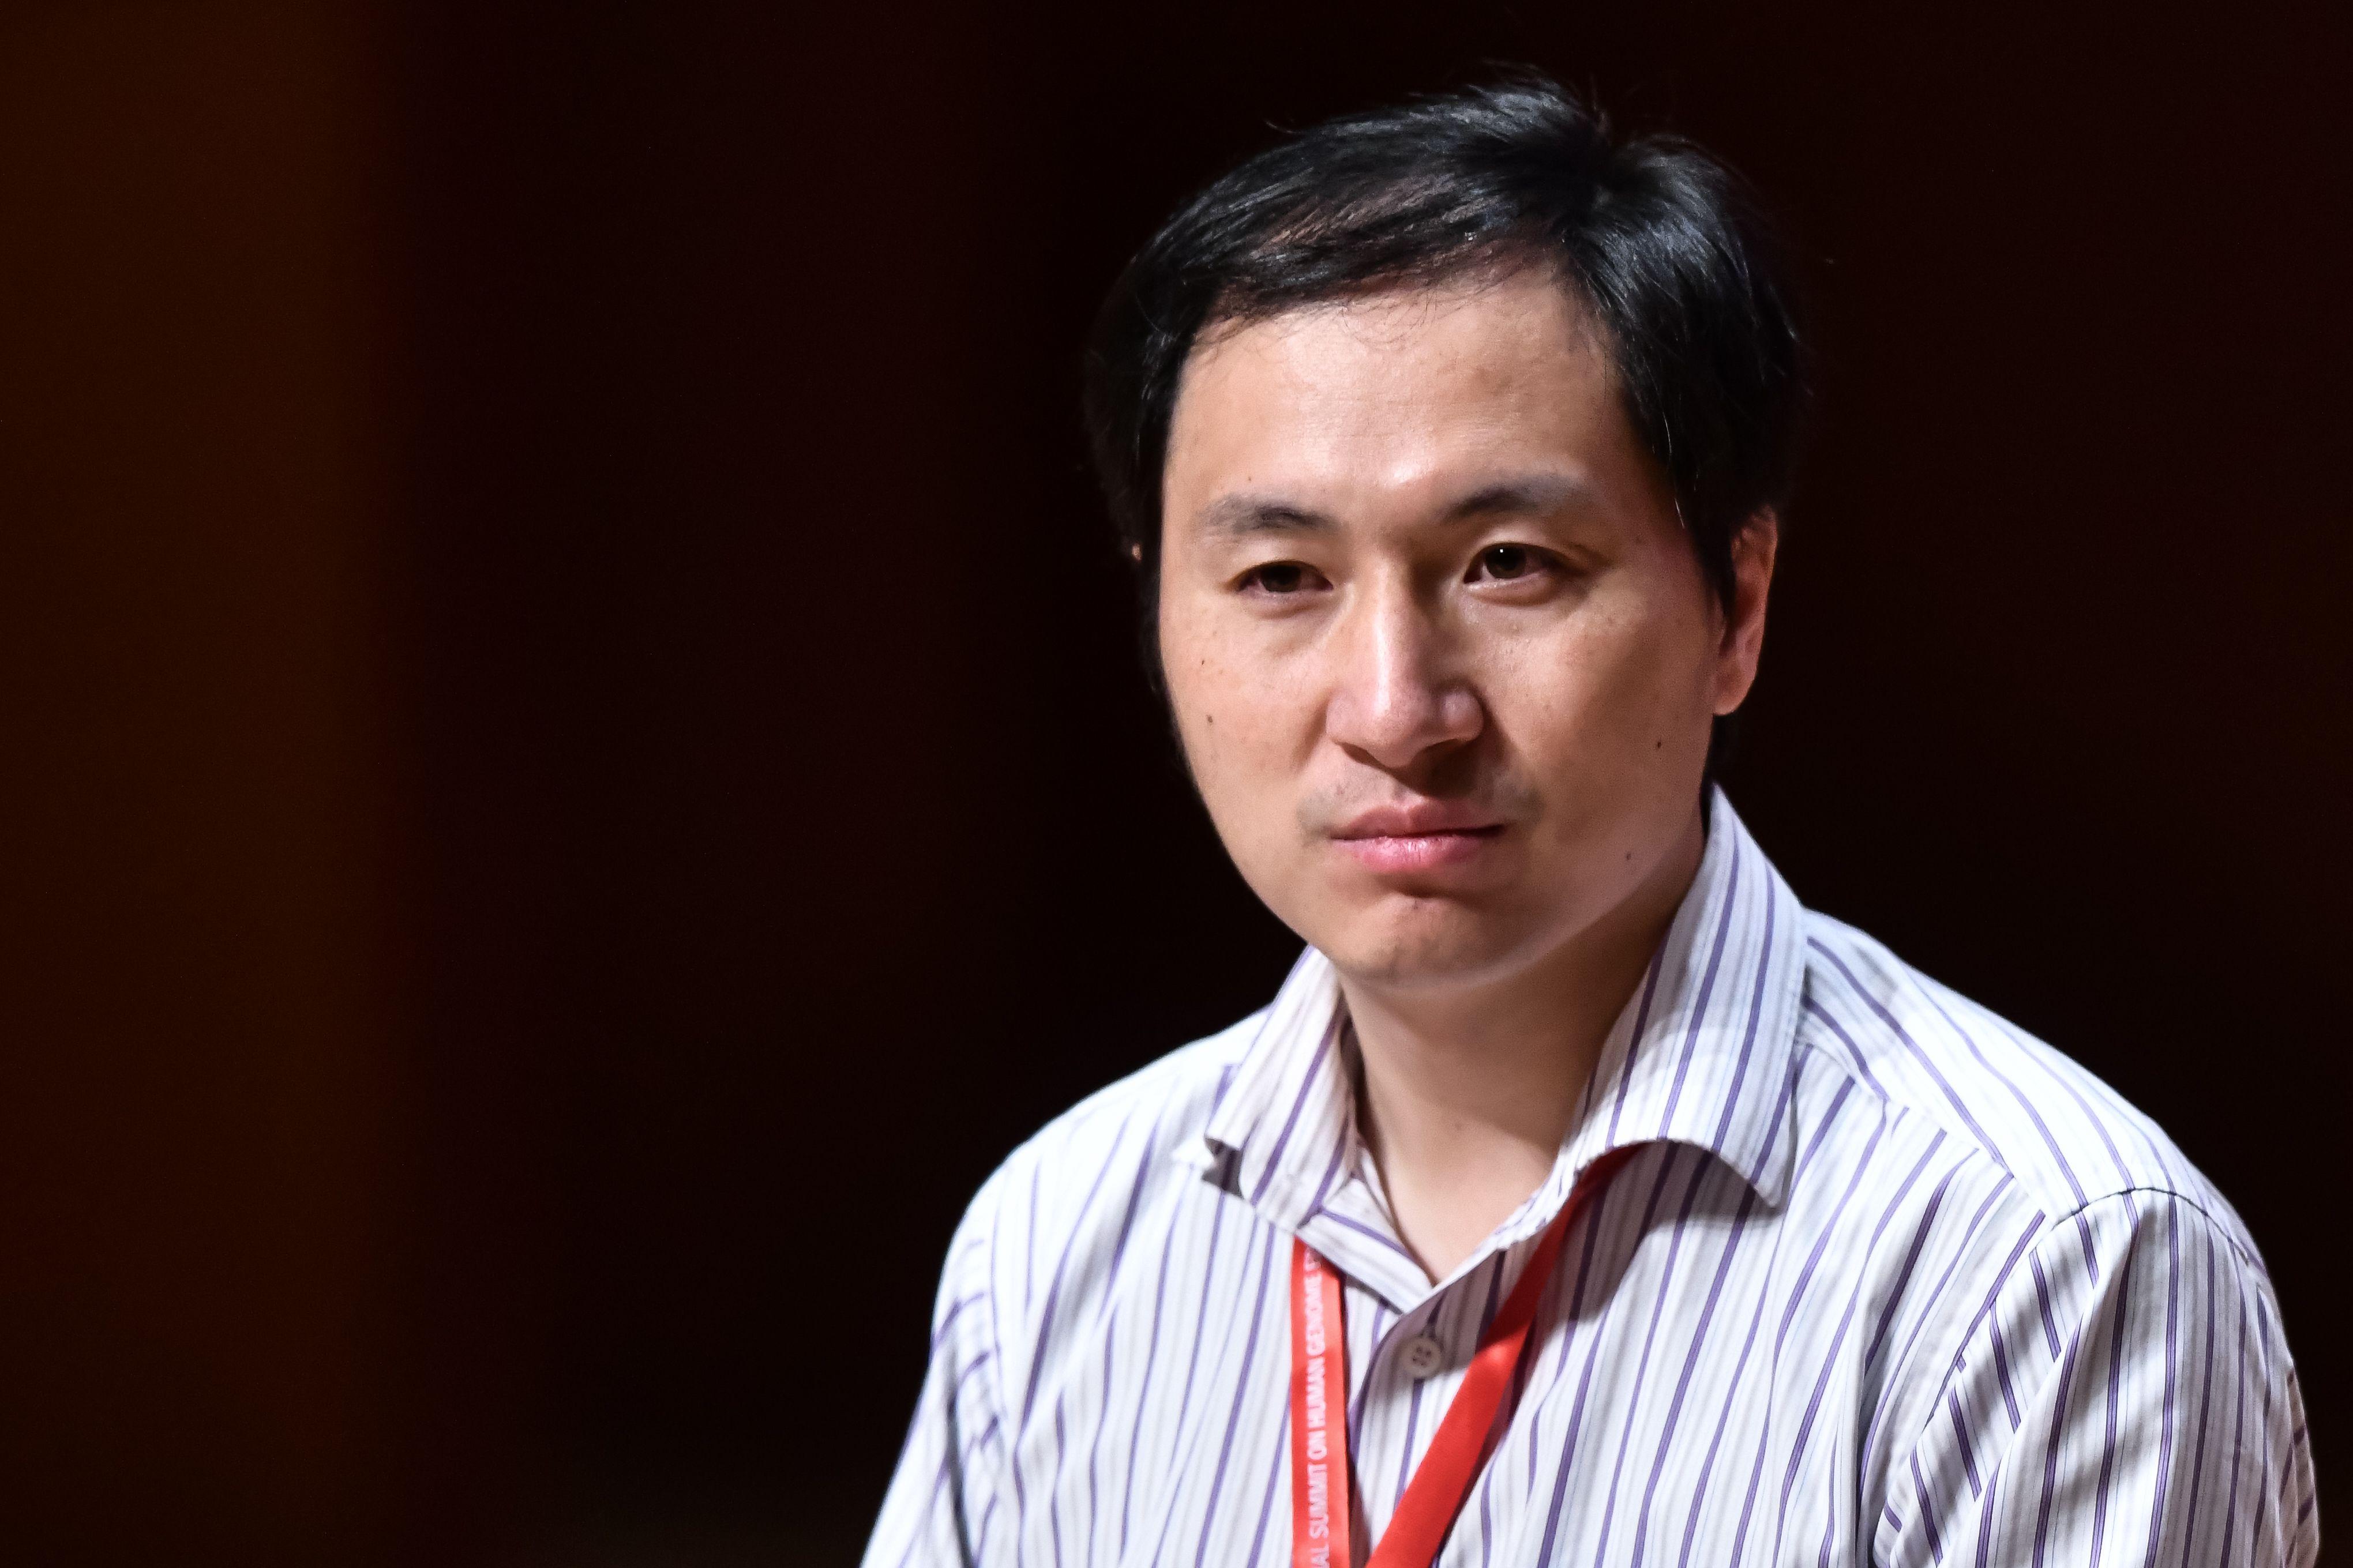 DOUNIAMAG-HONG KONG-CHINA-SCIENCE-GENETICS-RESEARCH-ETHICS